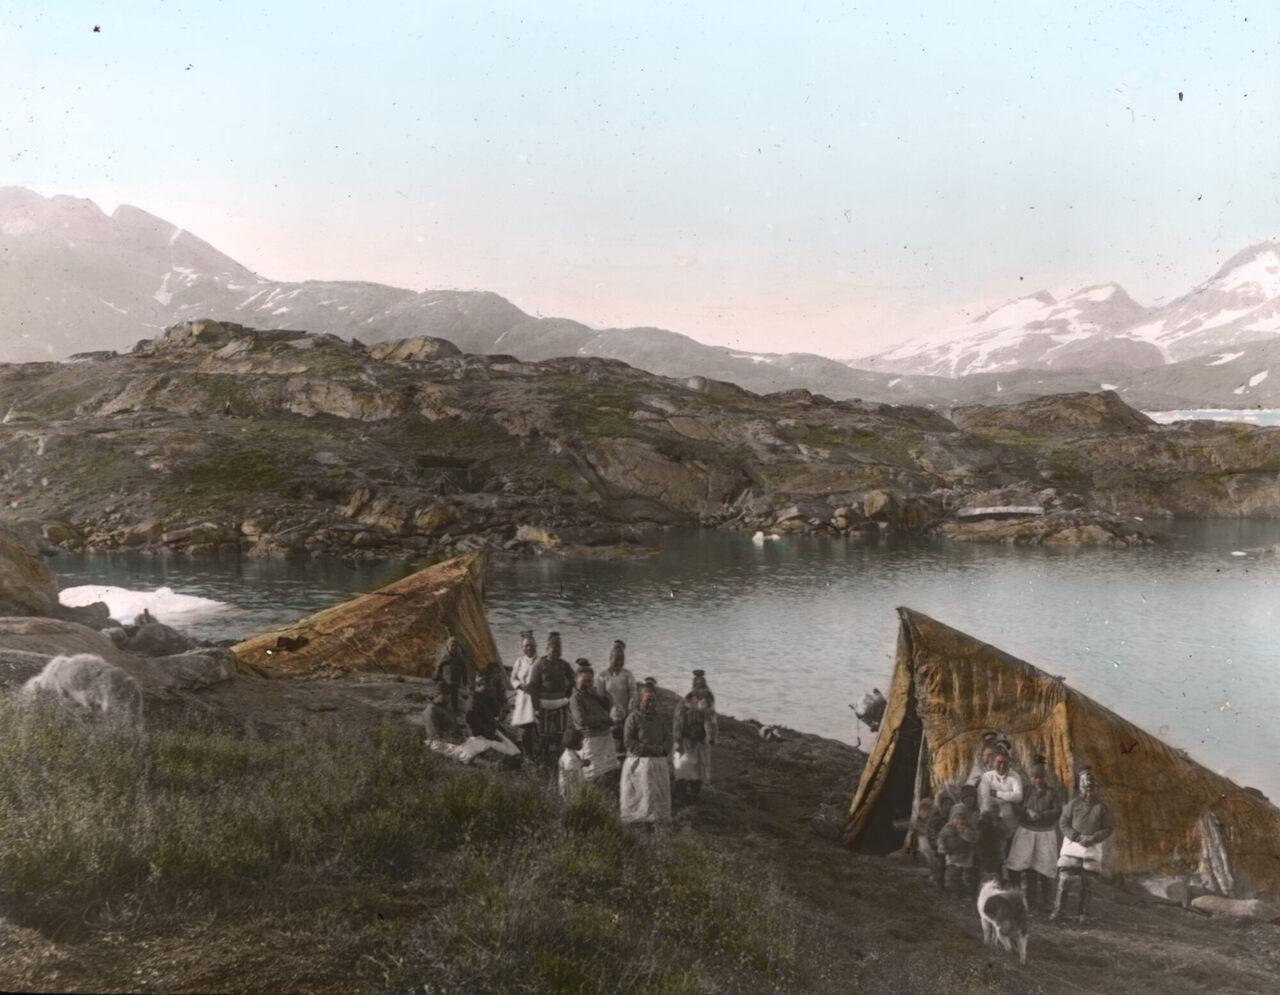 Summer tents at Ammassalik, East Greenland, 1904.